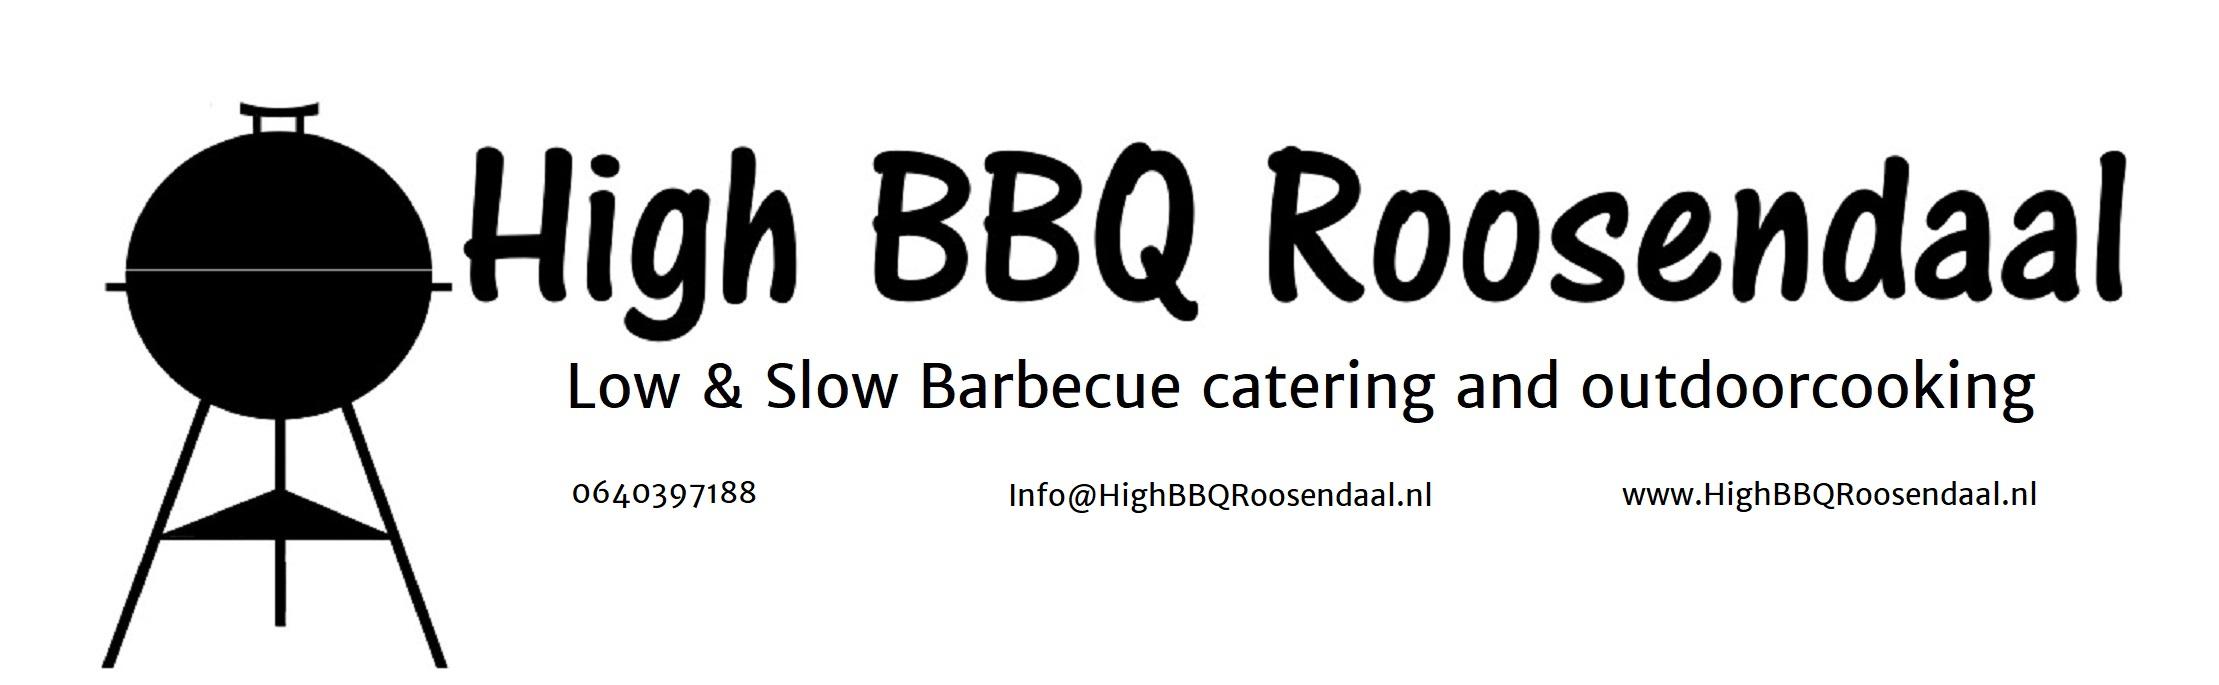 logo High BBQ Roosendaal-lang